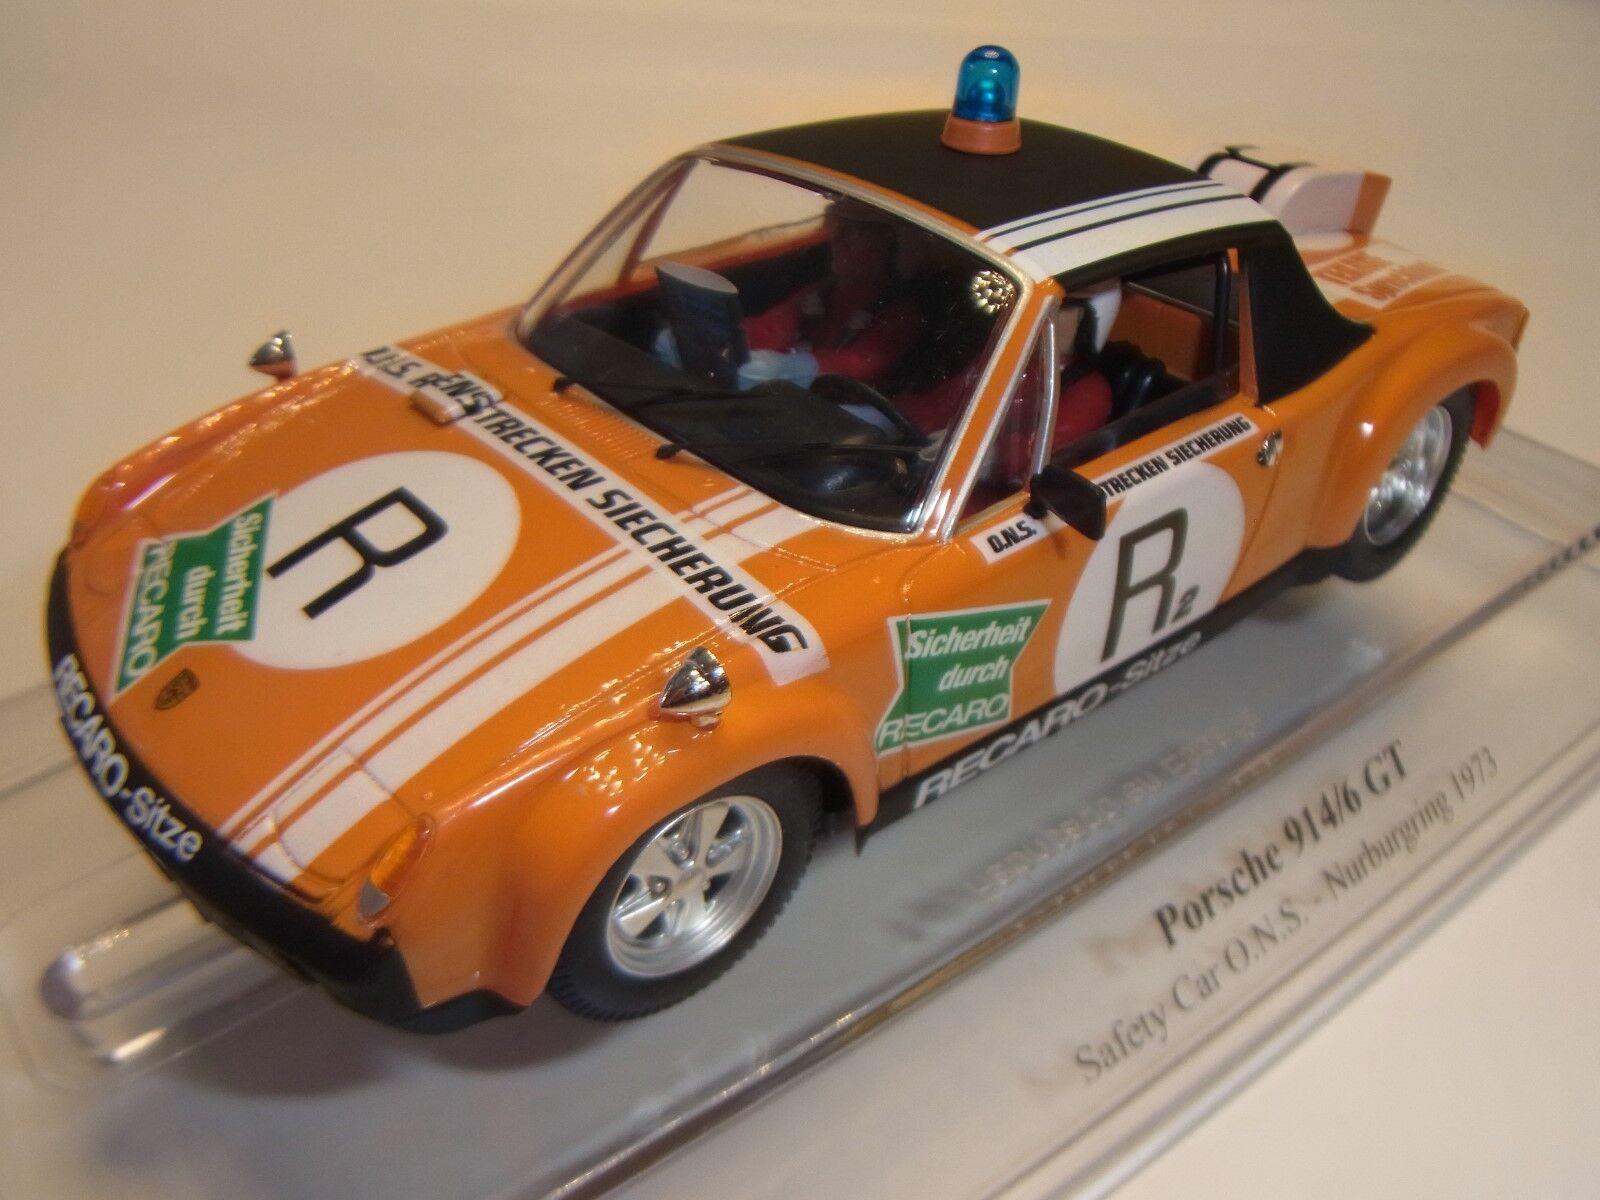 Src Porsche 914 6 Gt Safety Coche Ons SRC01605 Circuito de Slot 1  3 2 1973